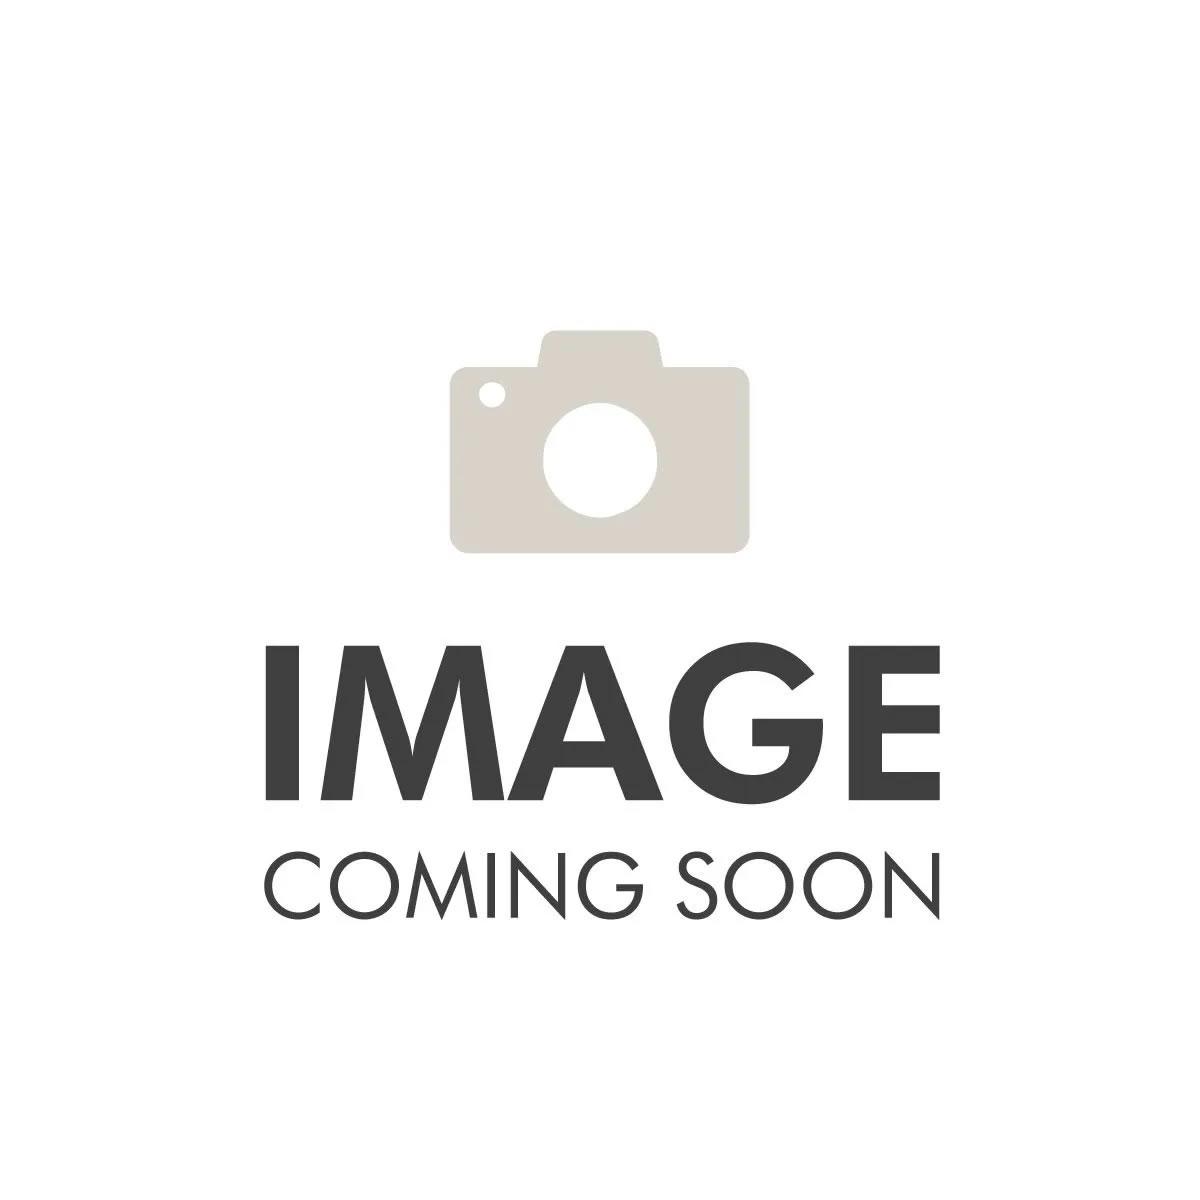 Header Roll Bar Top, Black Denim; 97-06 Jeep Wrangler TJ